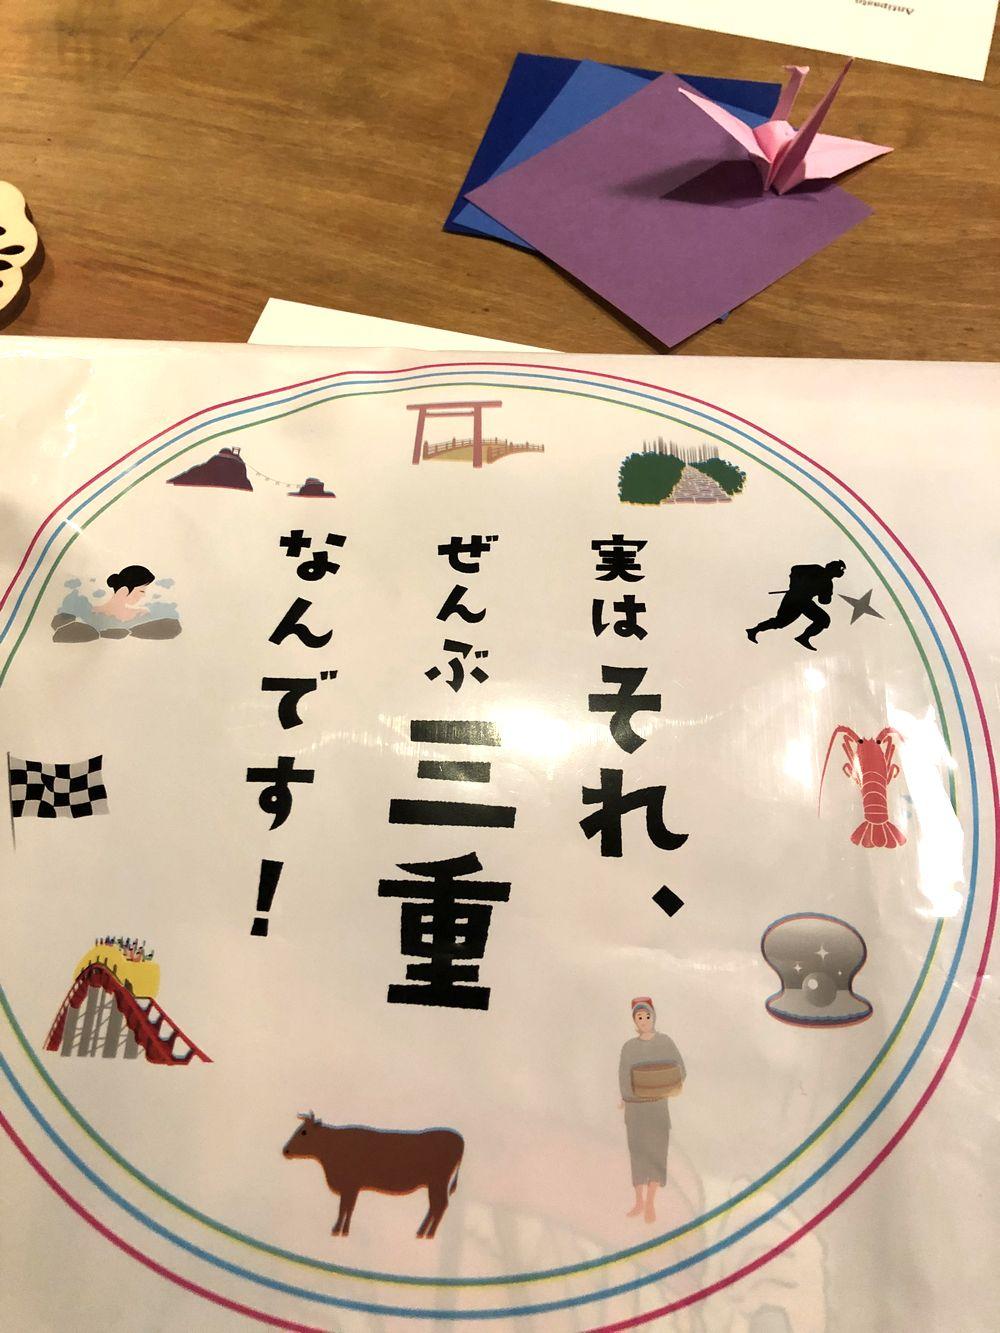 【City イベント】~三重湯の山女子旅~アフターパーティに参加しました